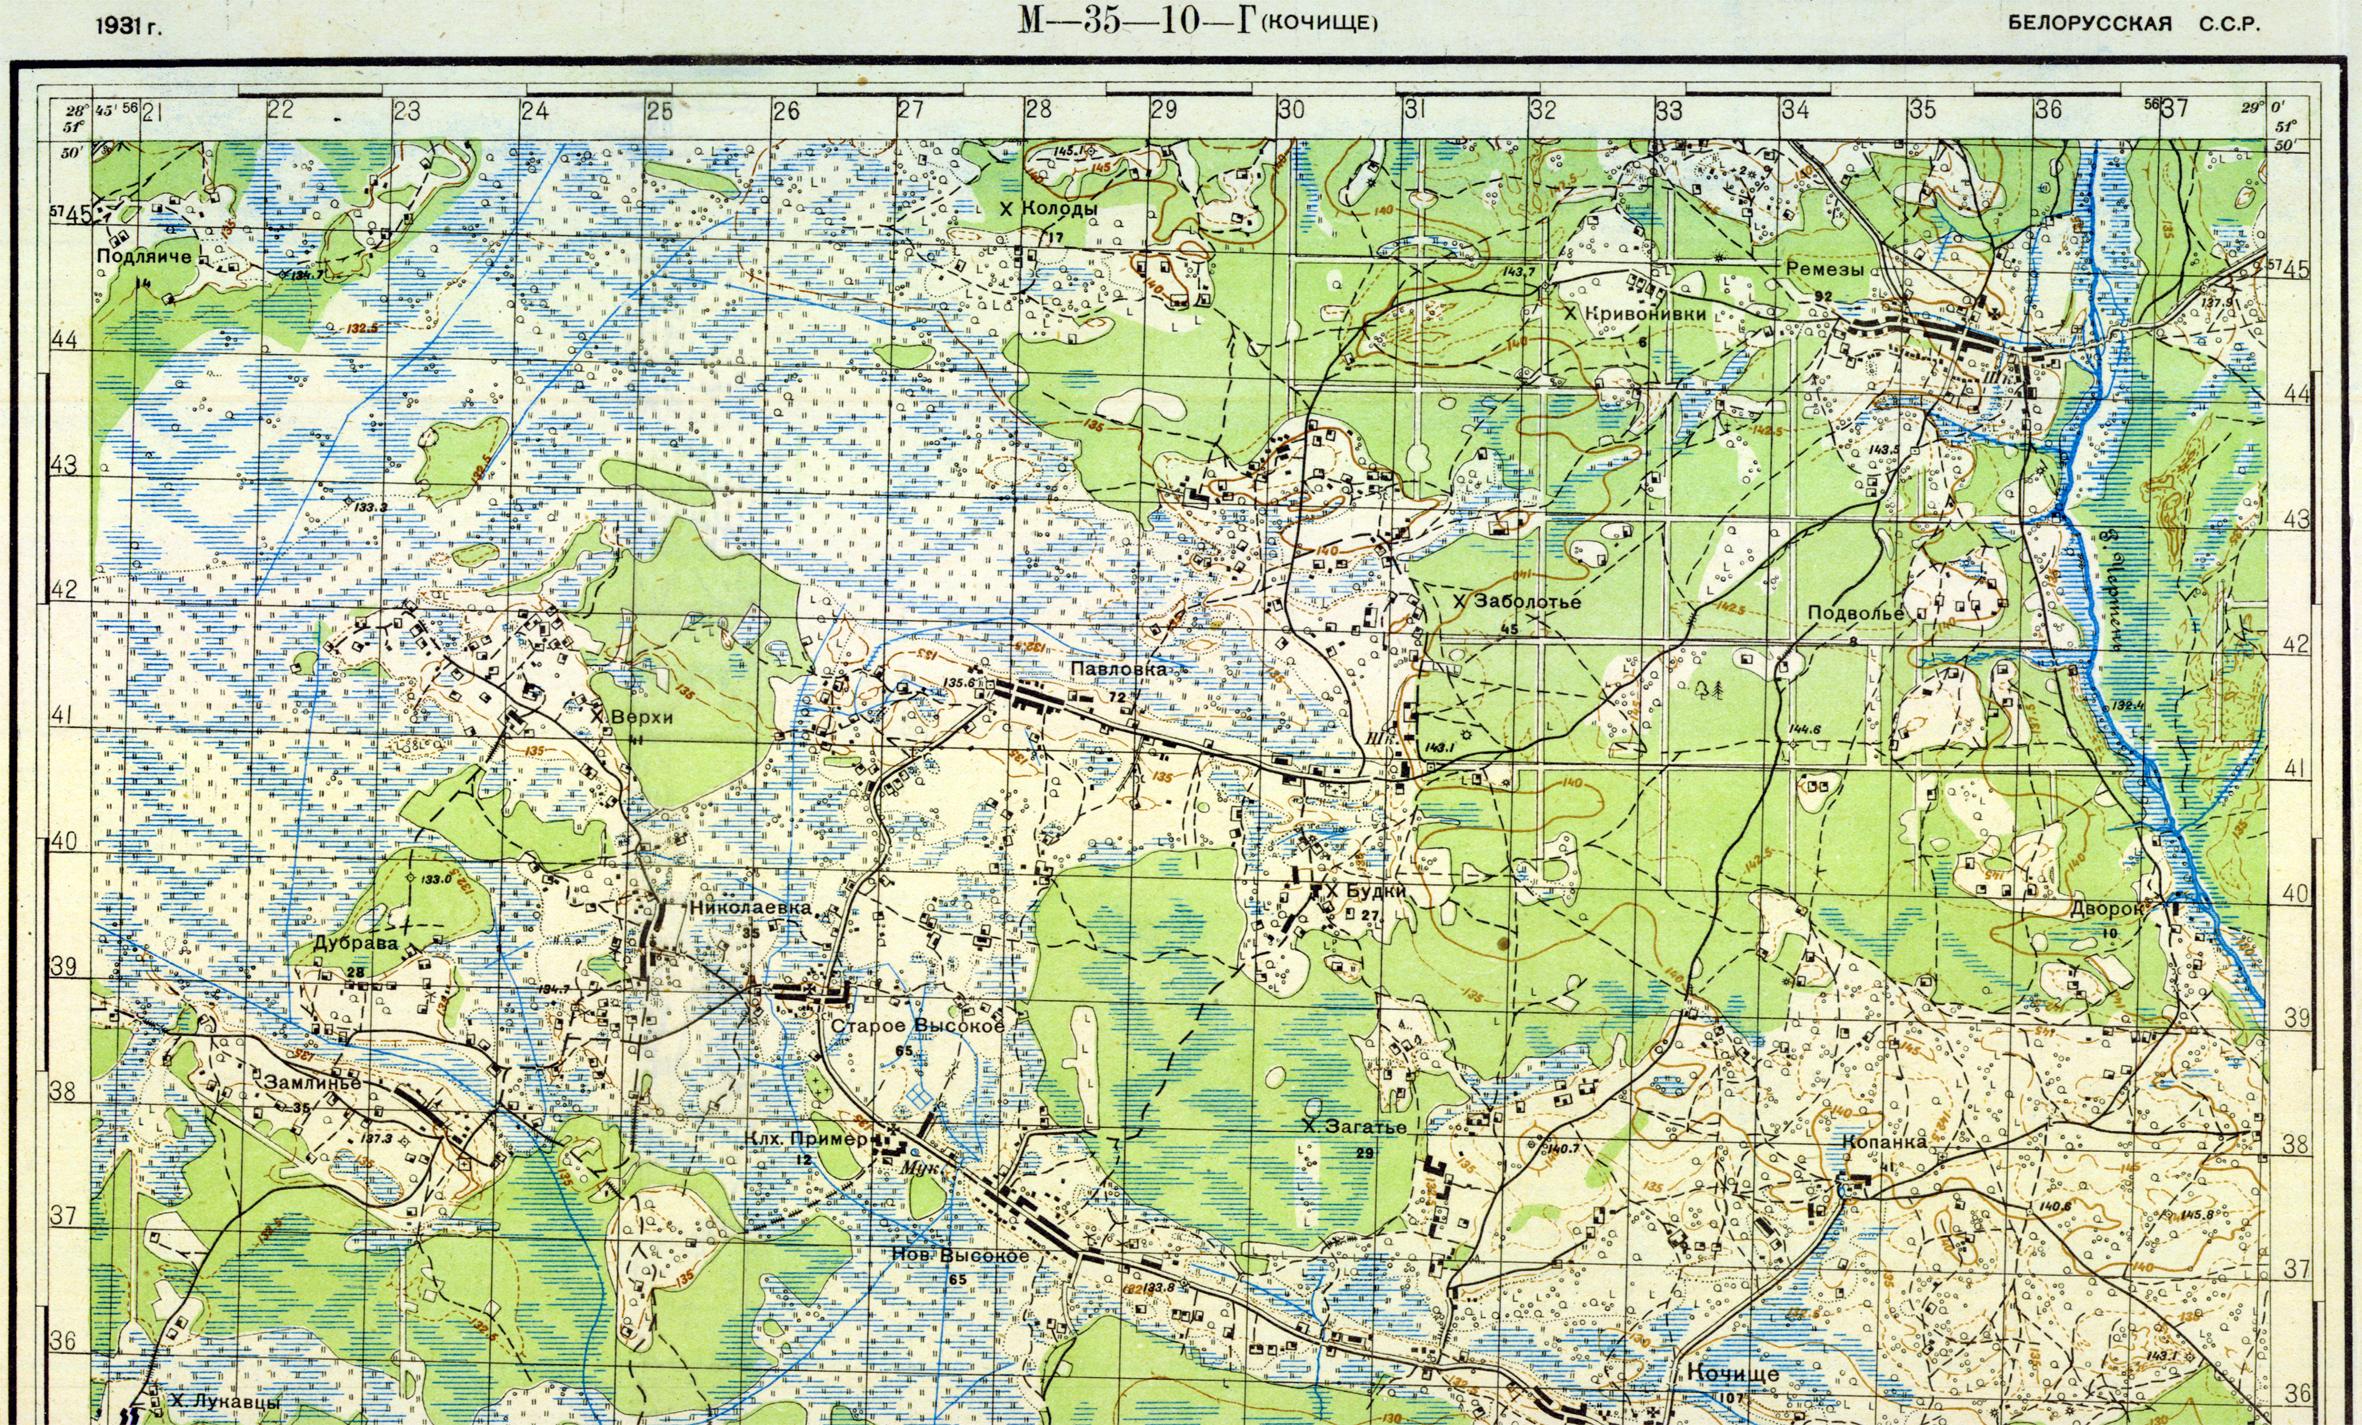 Карты ркка, 500 метровки генштаб квадрат м-35-10.